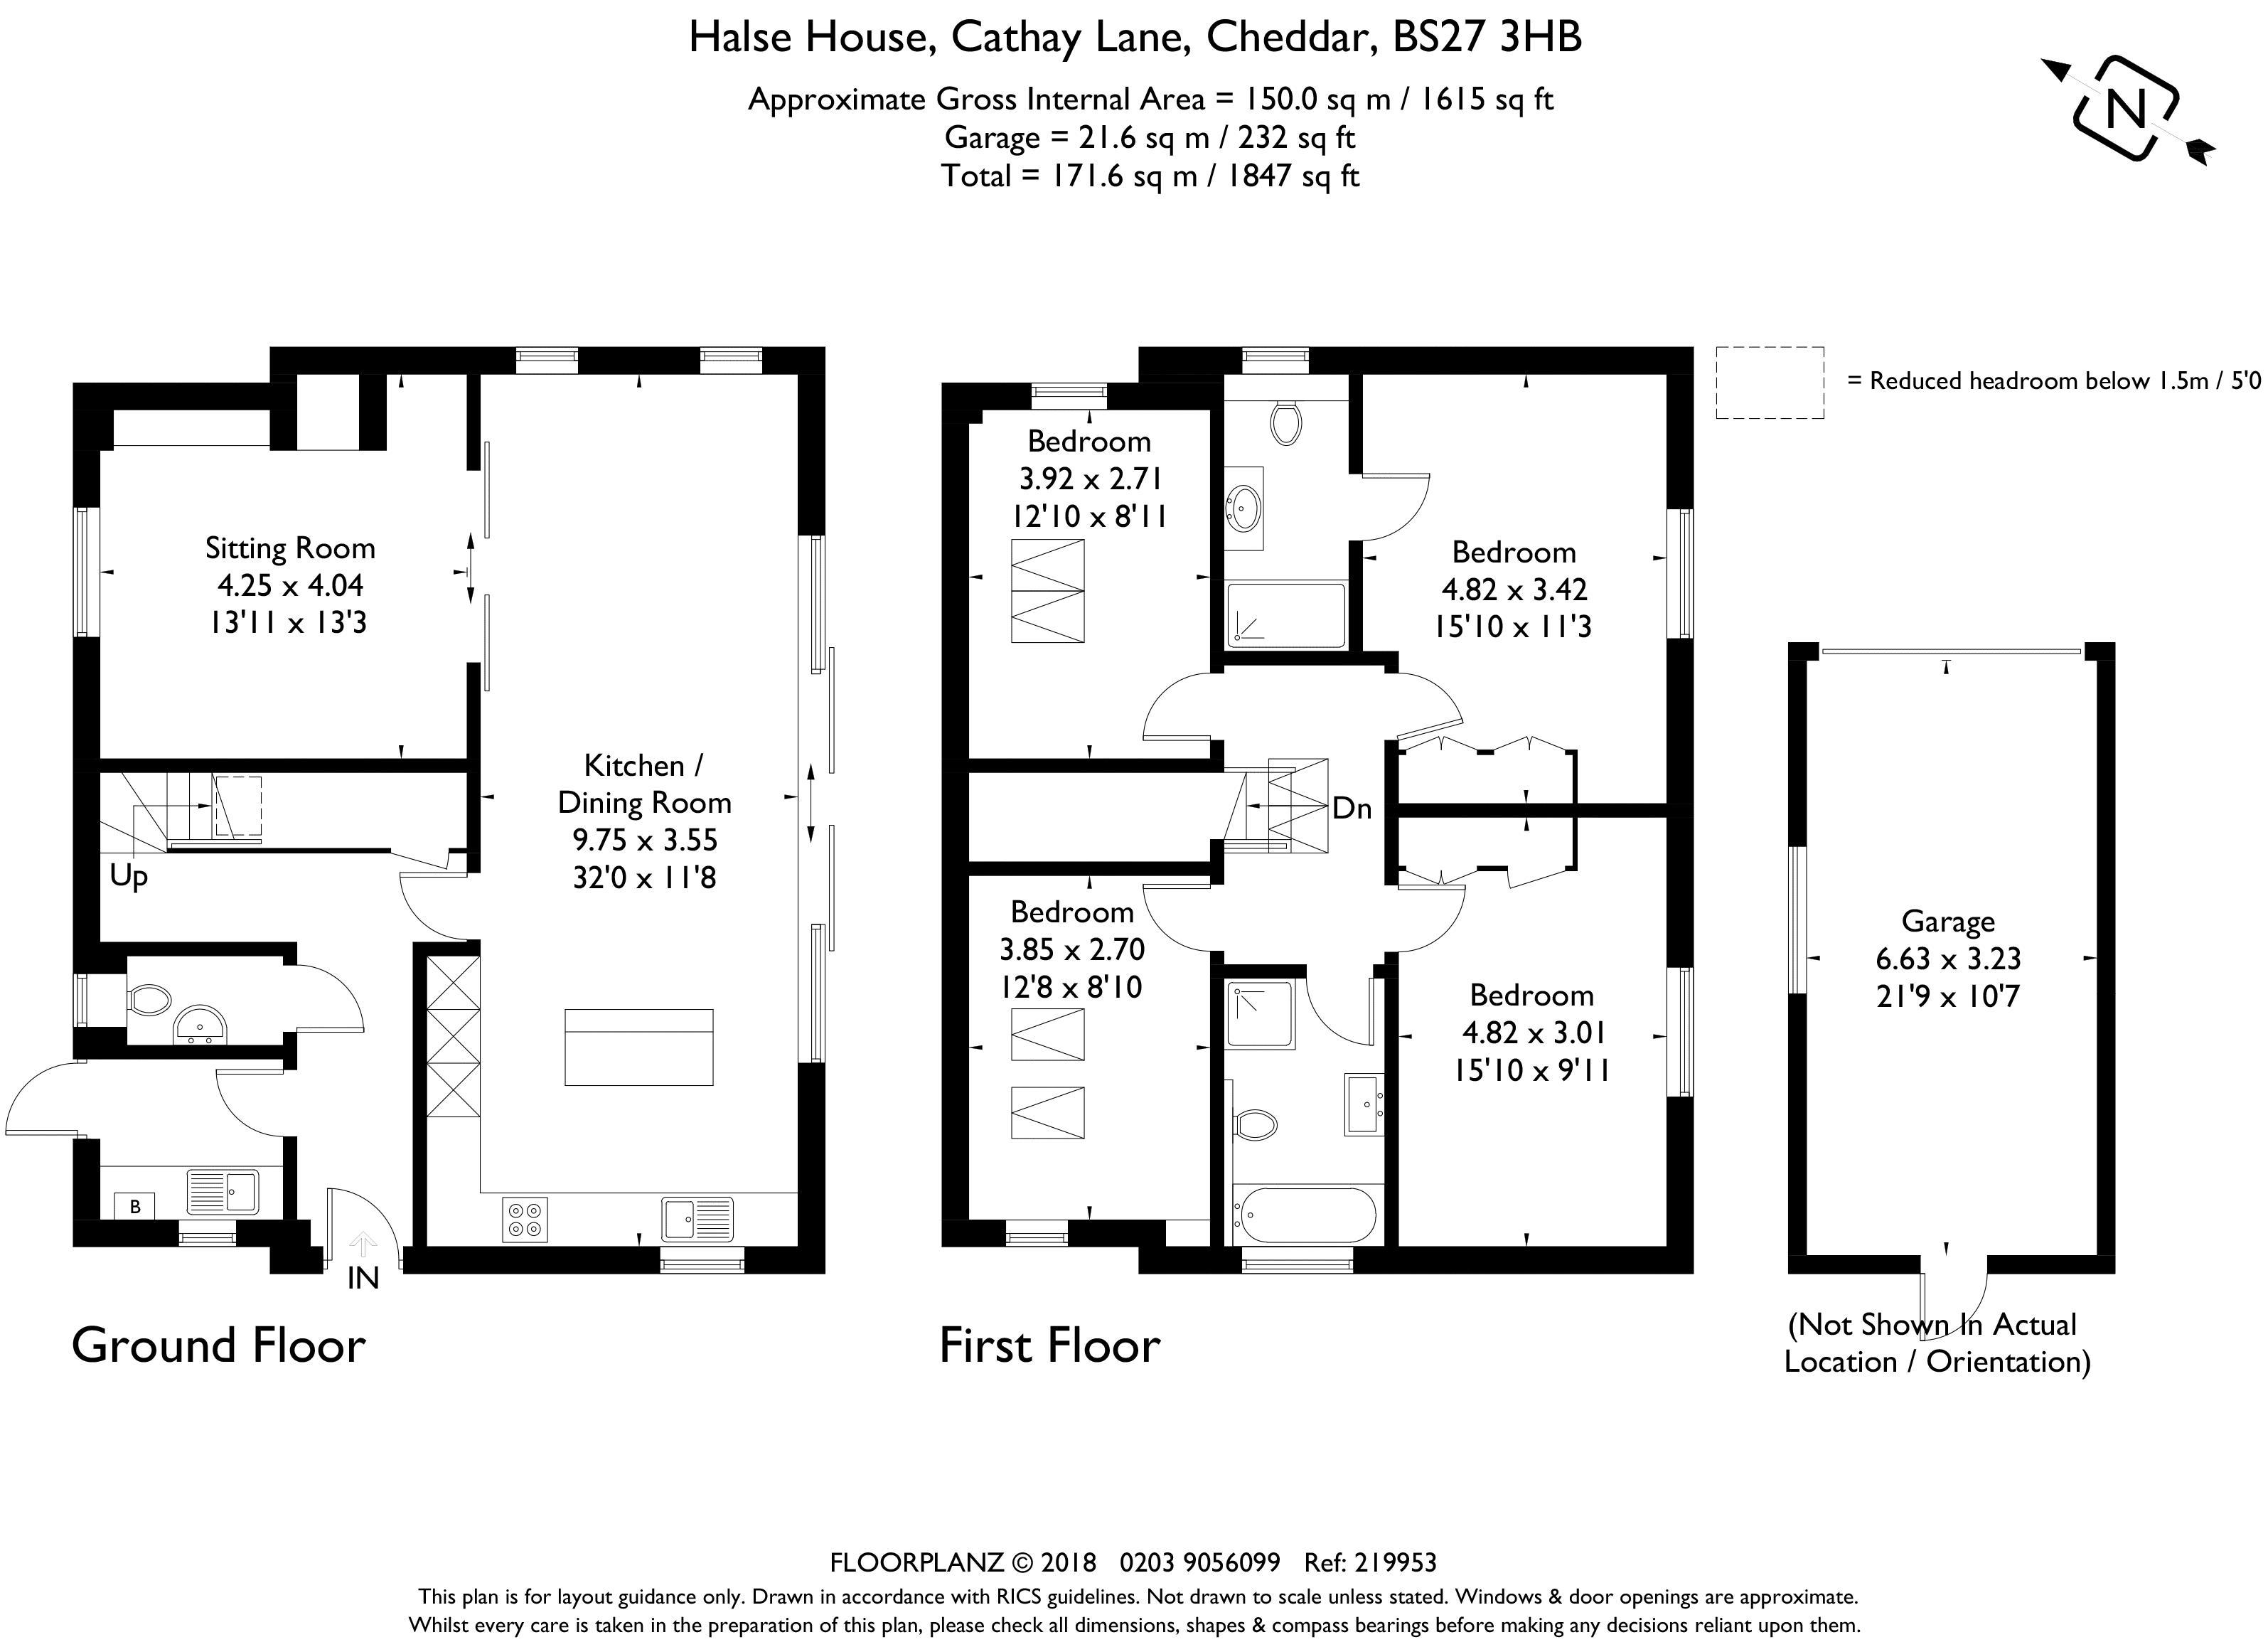 halse house cathy lane